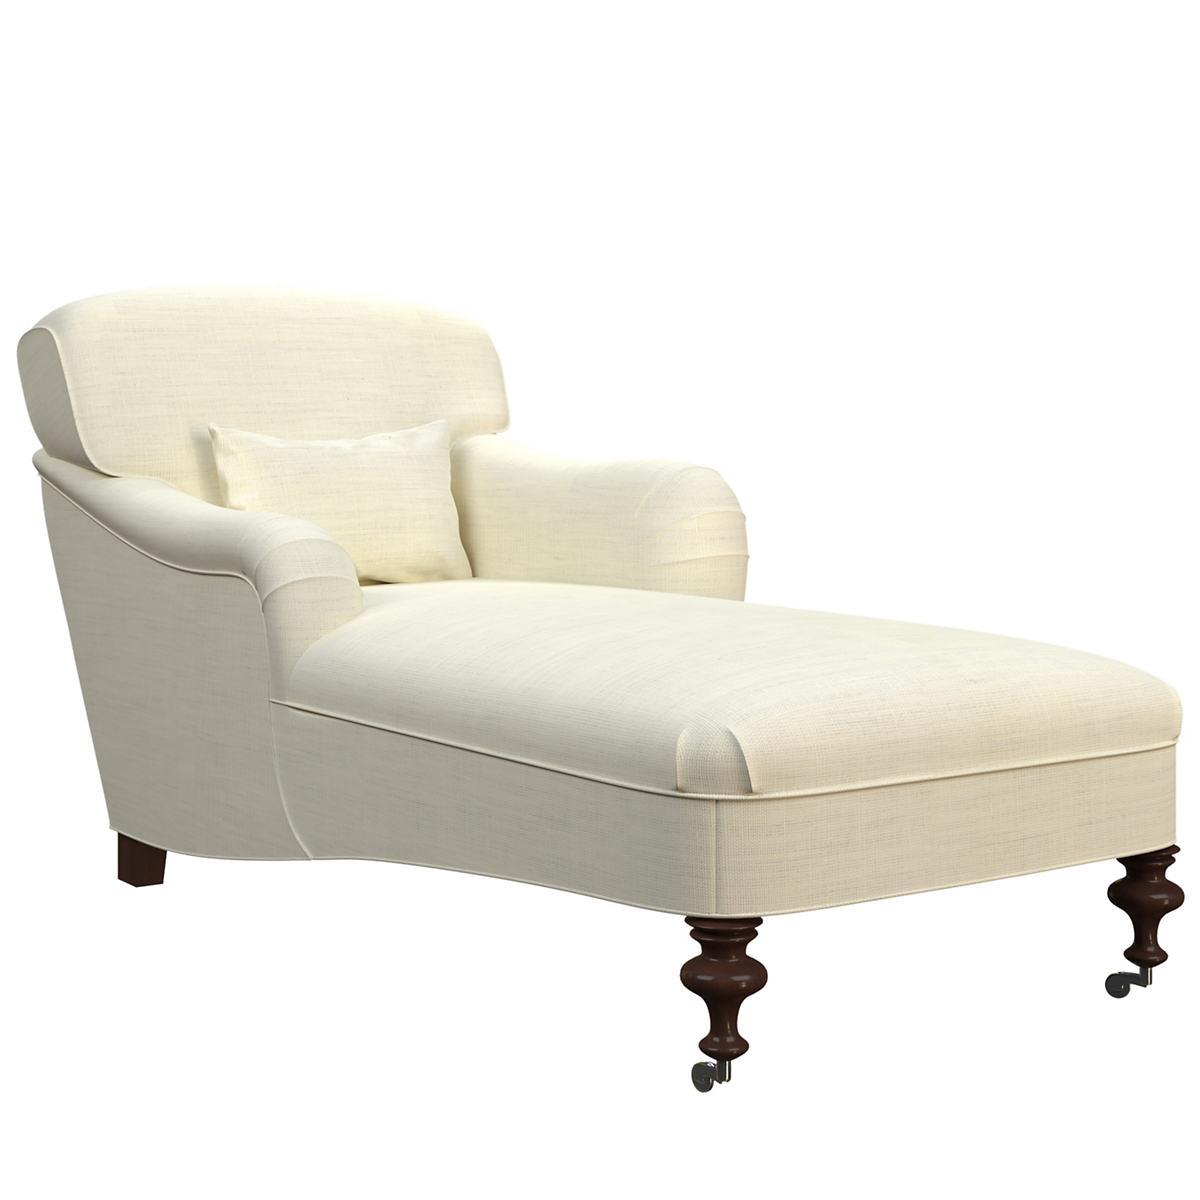 Estate Linen Ivory Beaufort Chaise